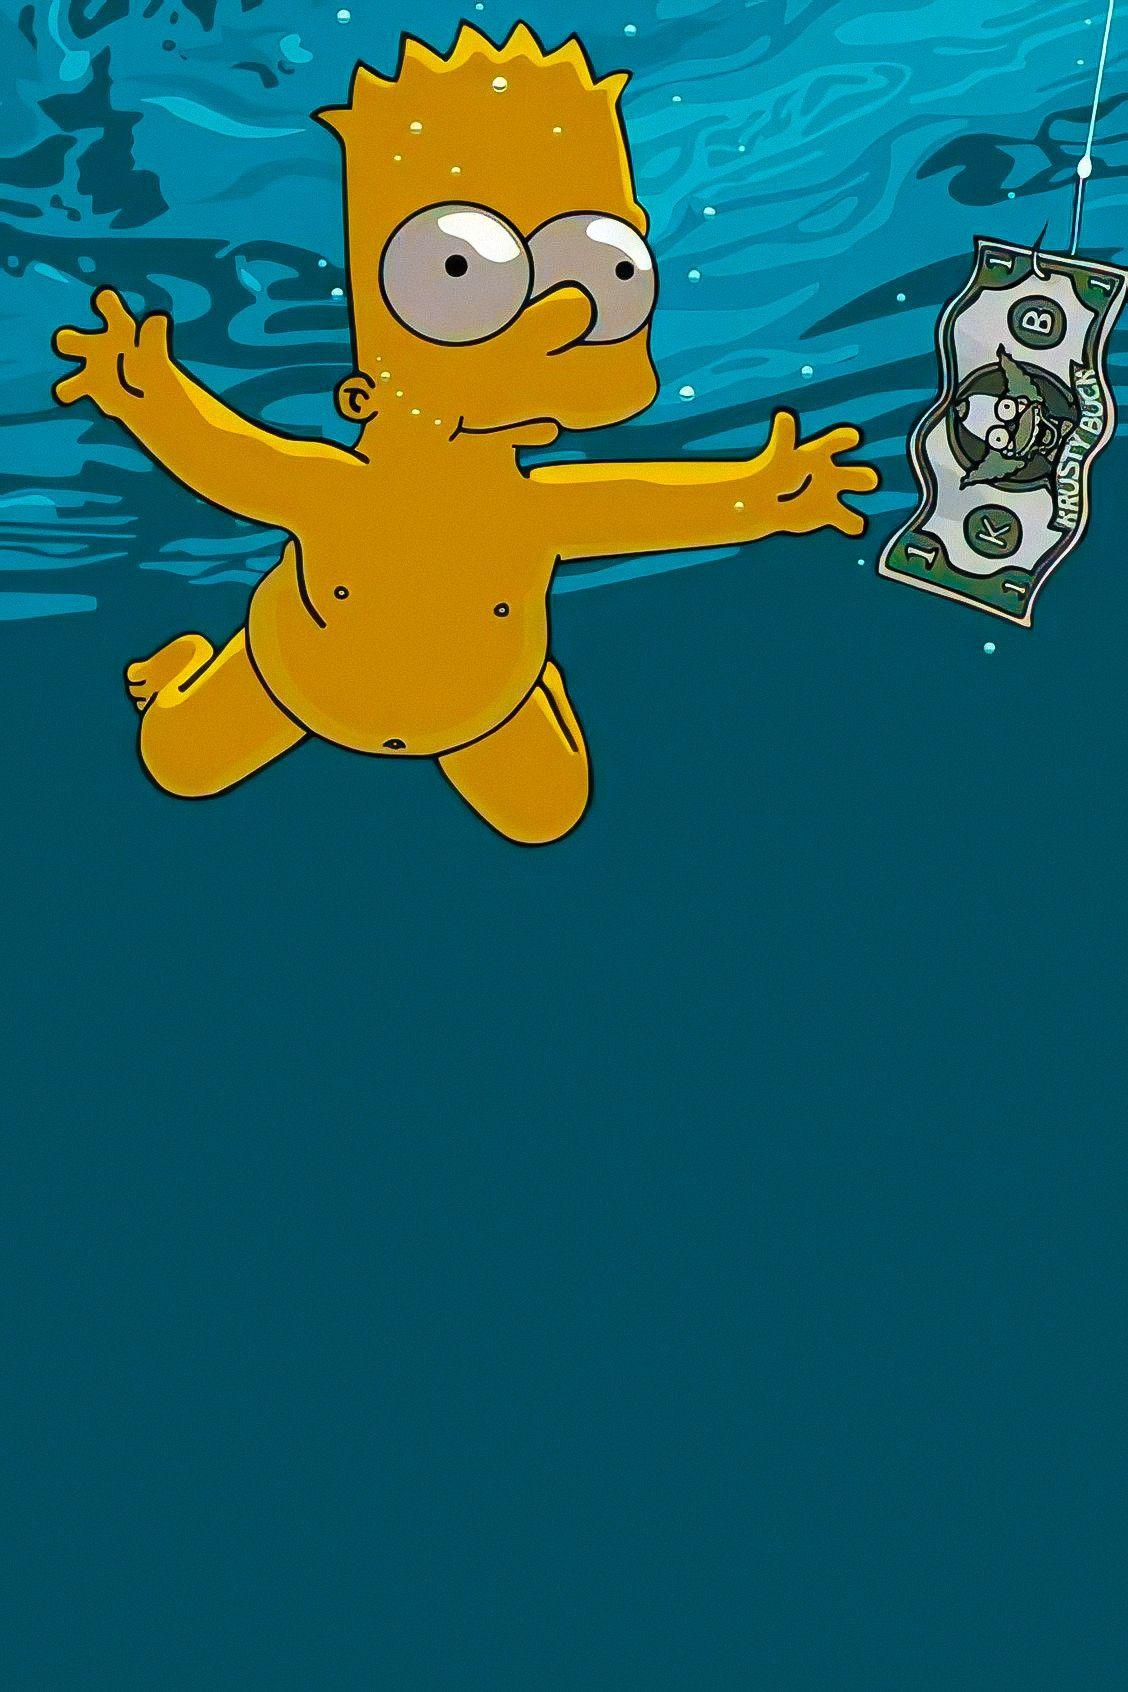 Bart Simpson In 2020 Simpson Wallpaper Iphone Hippie Wallpaper Tumblr Iphone Wallpaper